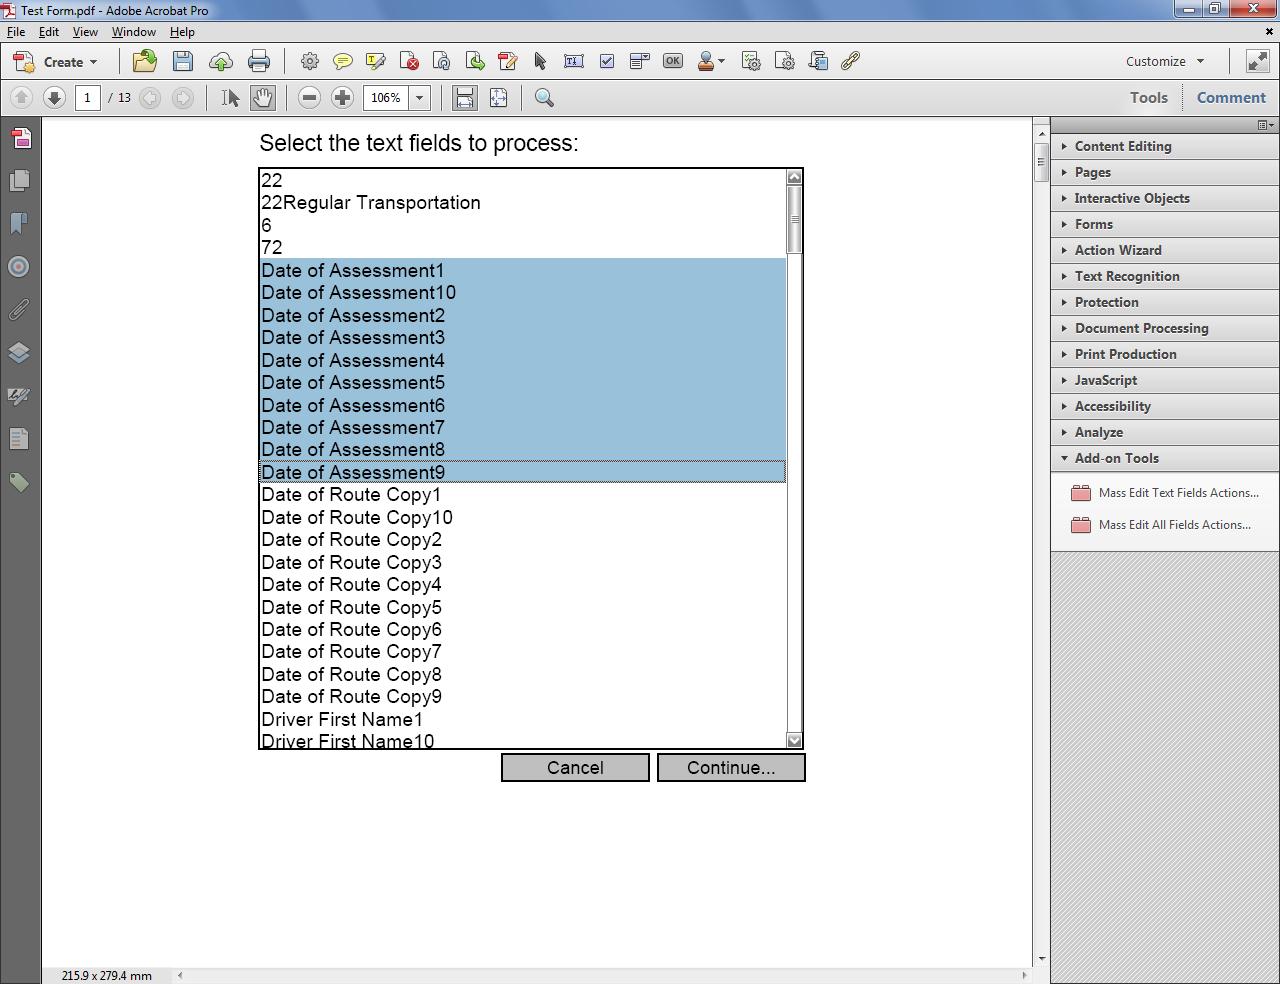 adobe acrobat - Format Fonts for Text Field Default Values - Super ...